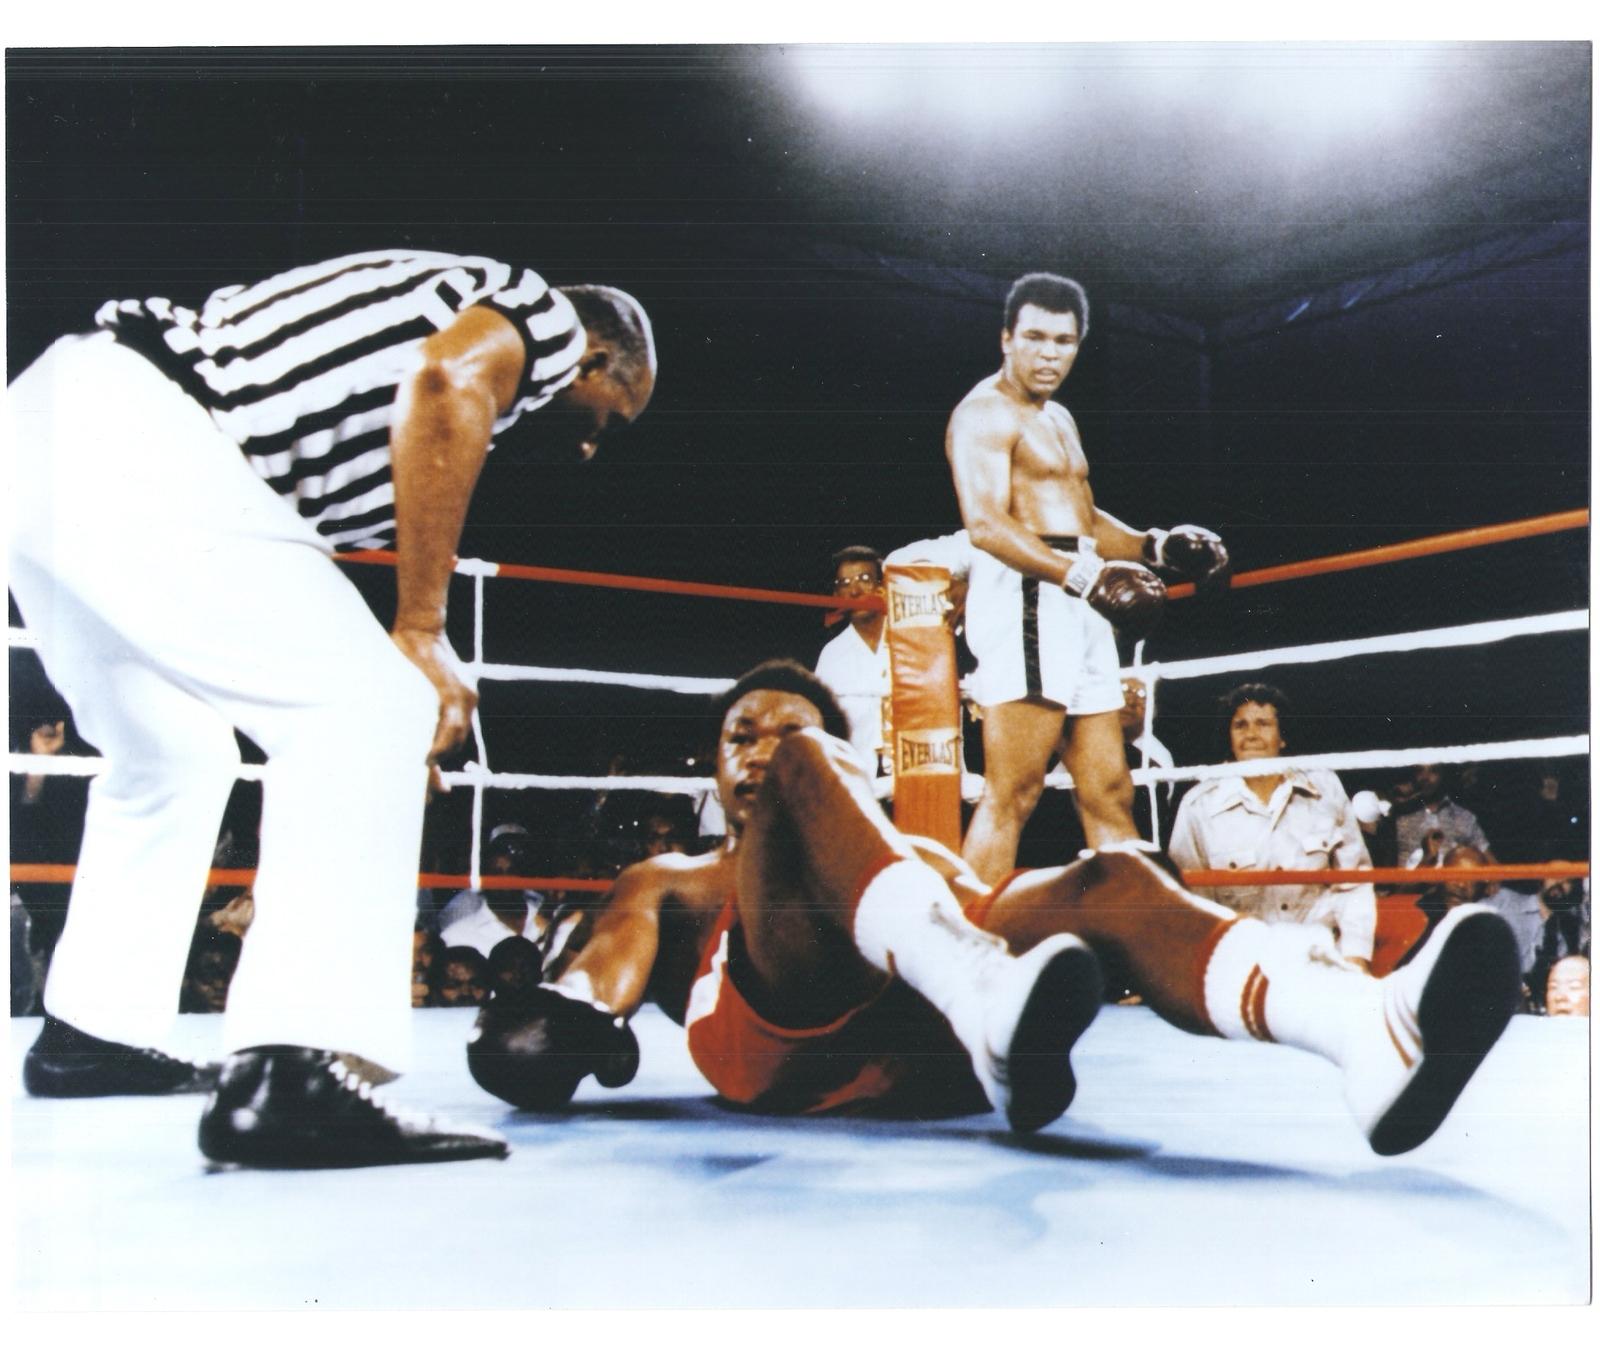 Muhammad Ali George Foreman 4 Zaire Vintage 11X14 Color Boxing Memorabilia Phot - $15.95